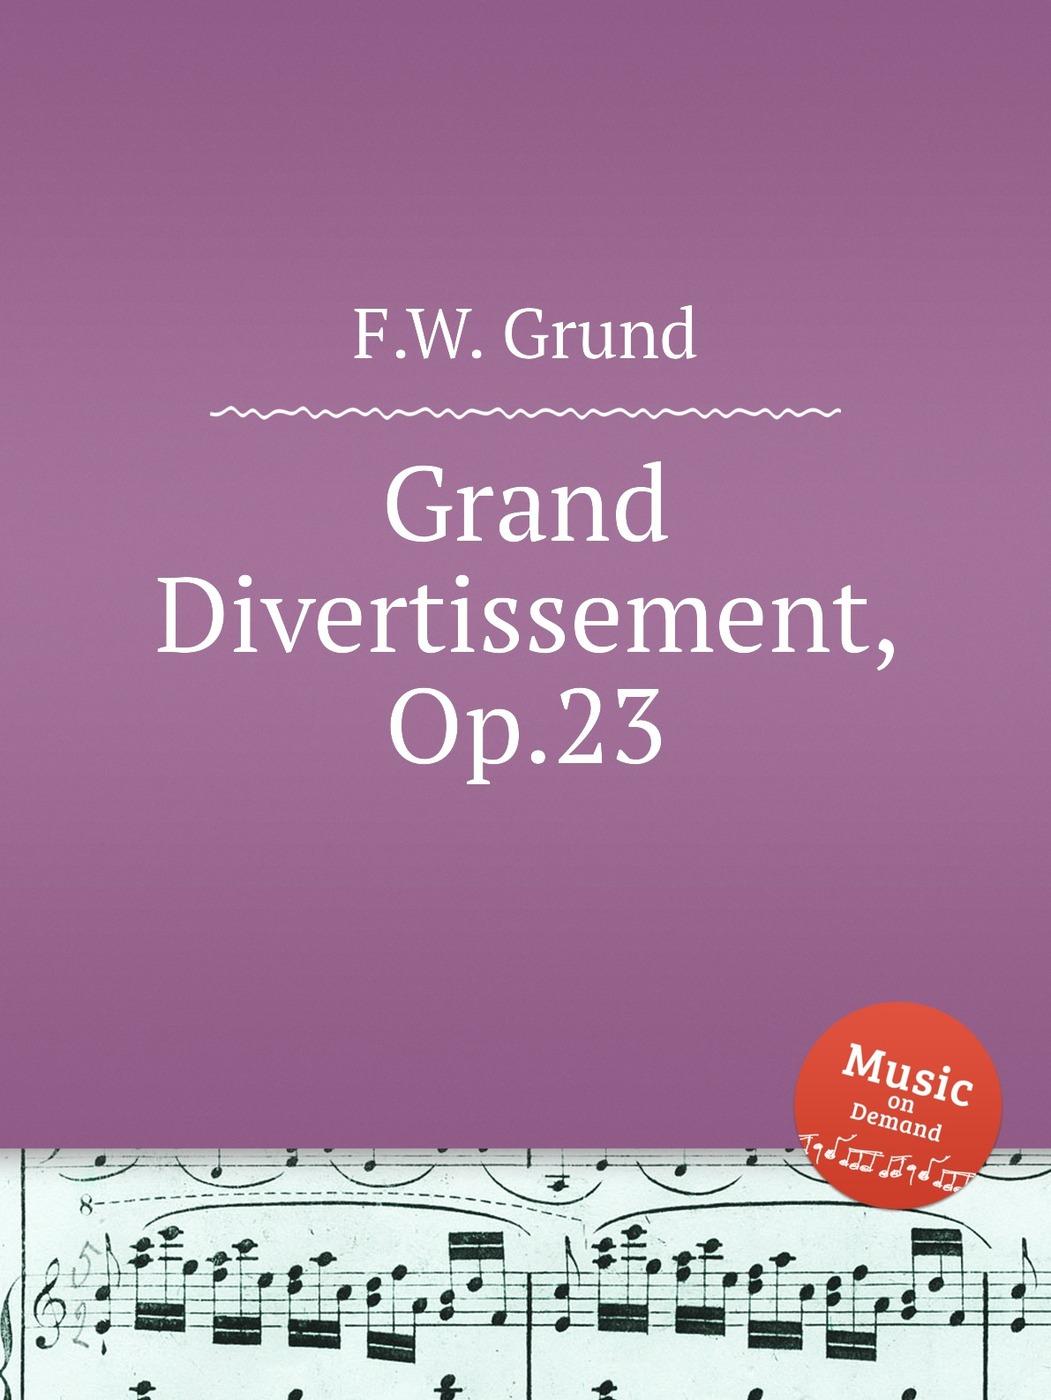 Grand Divertissement, Op.23